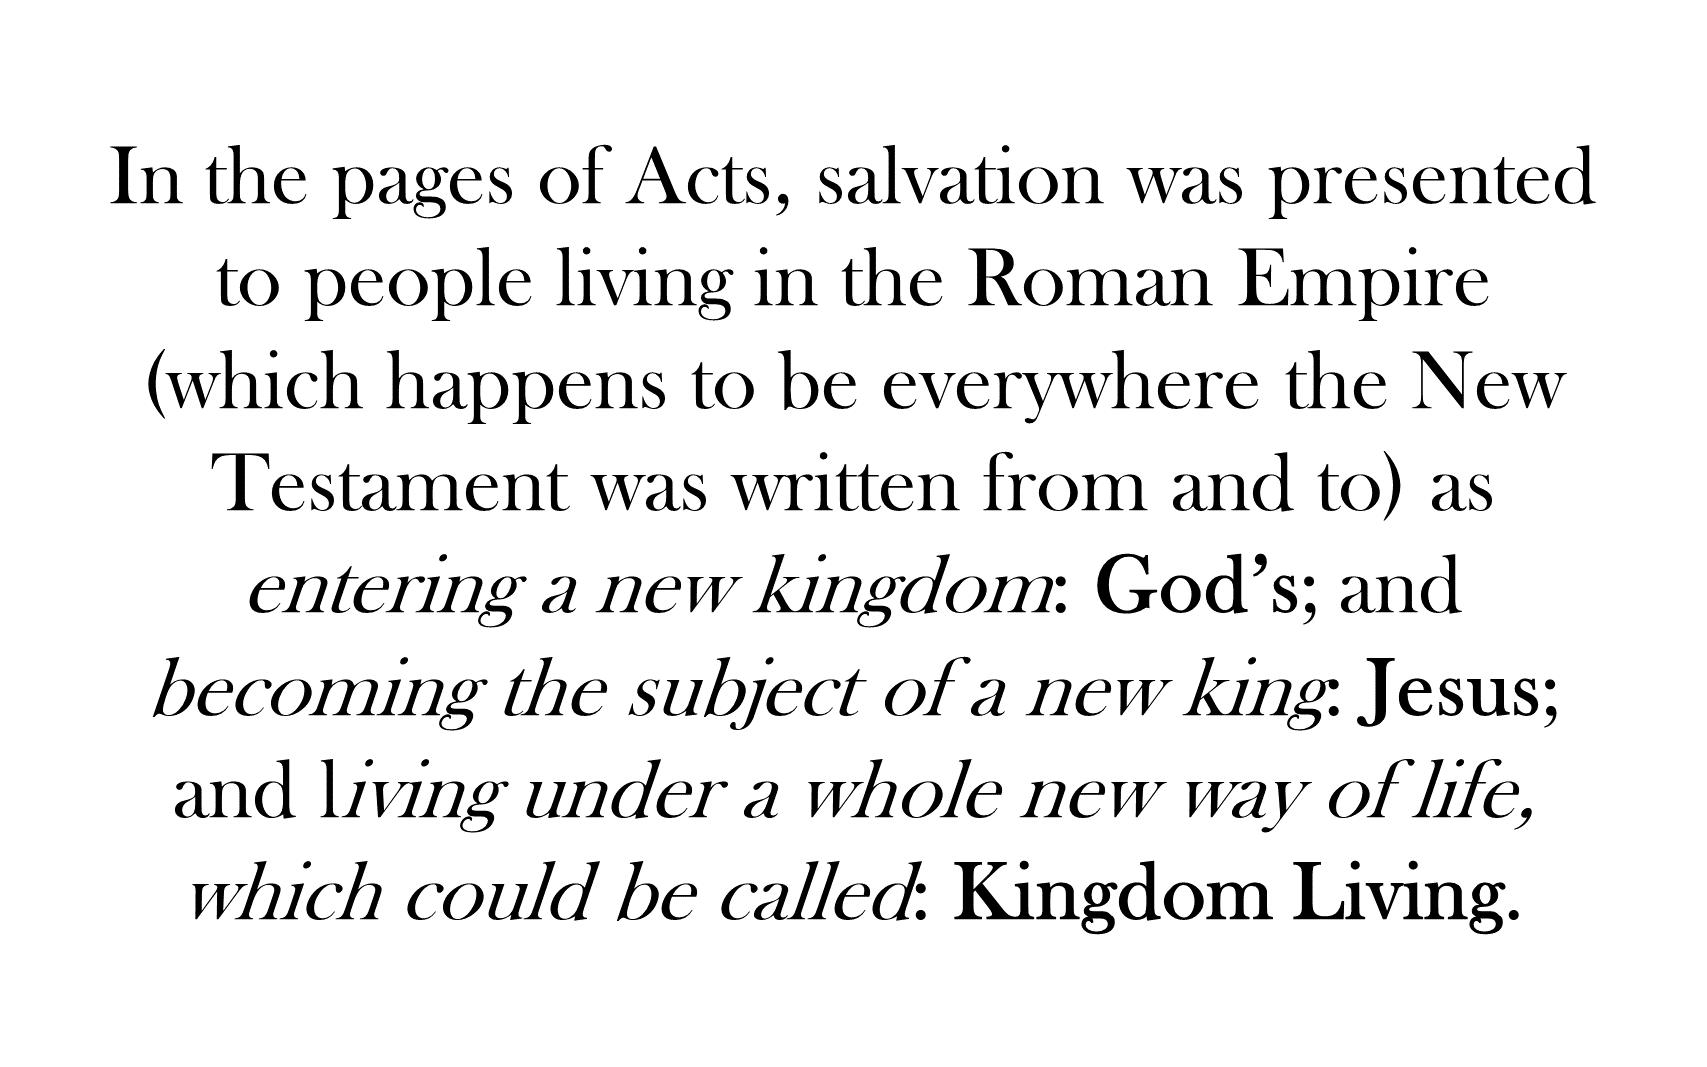 ESH-20 - The Discipline Of Disciple-Making - Seeing, Understanding, Entering, Living, & Seeking The Kingdom Of God ( (3)